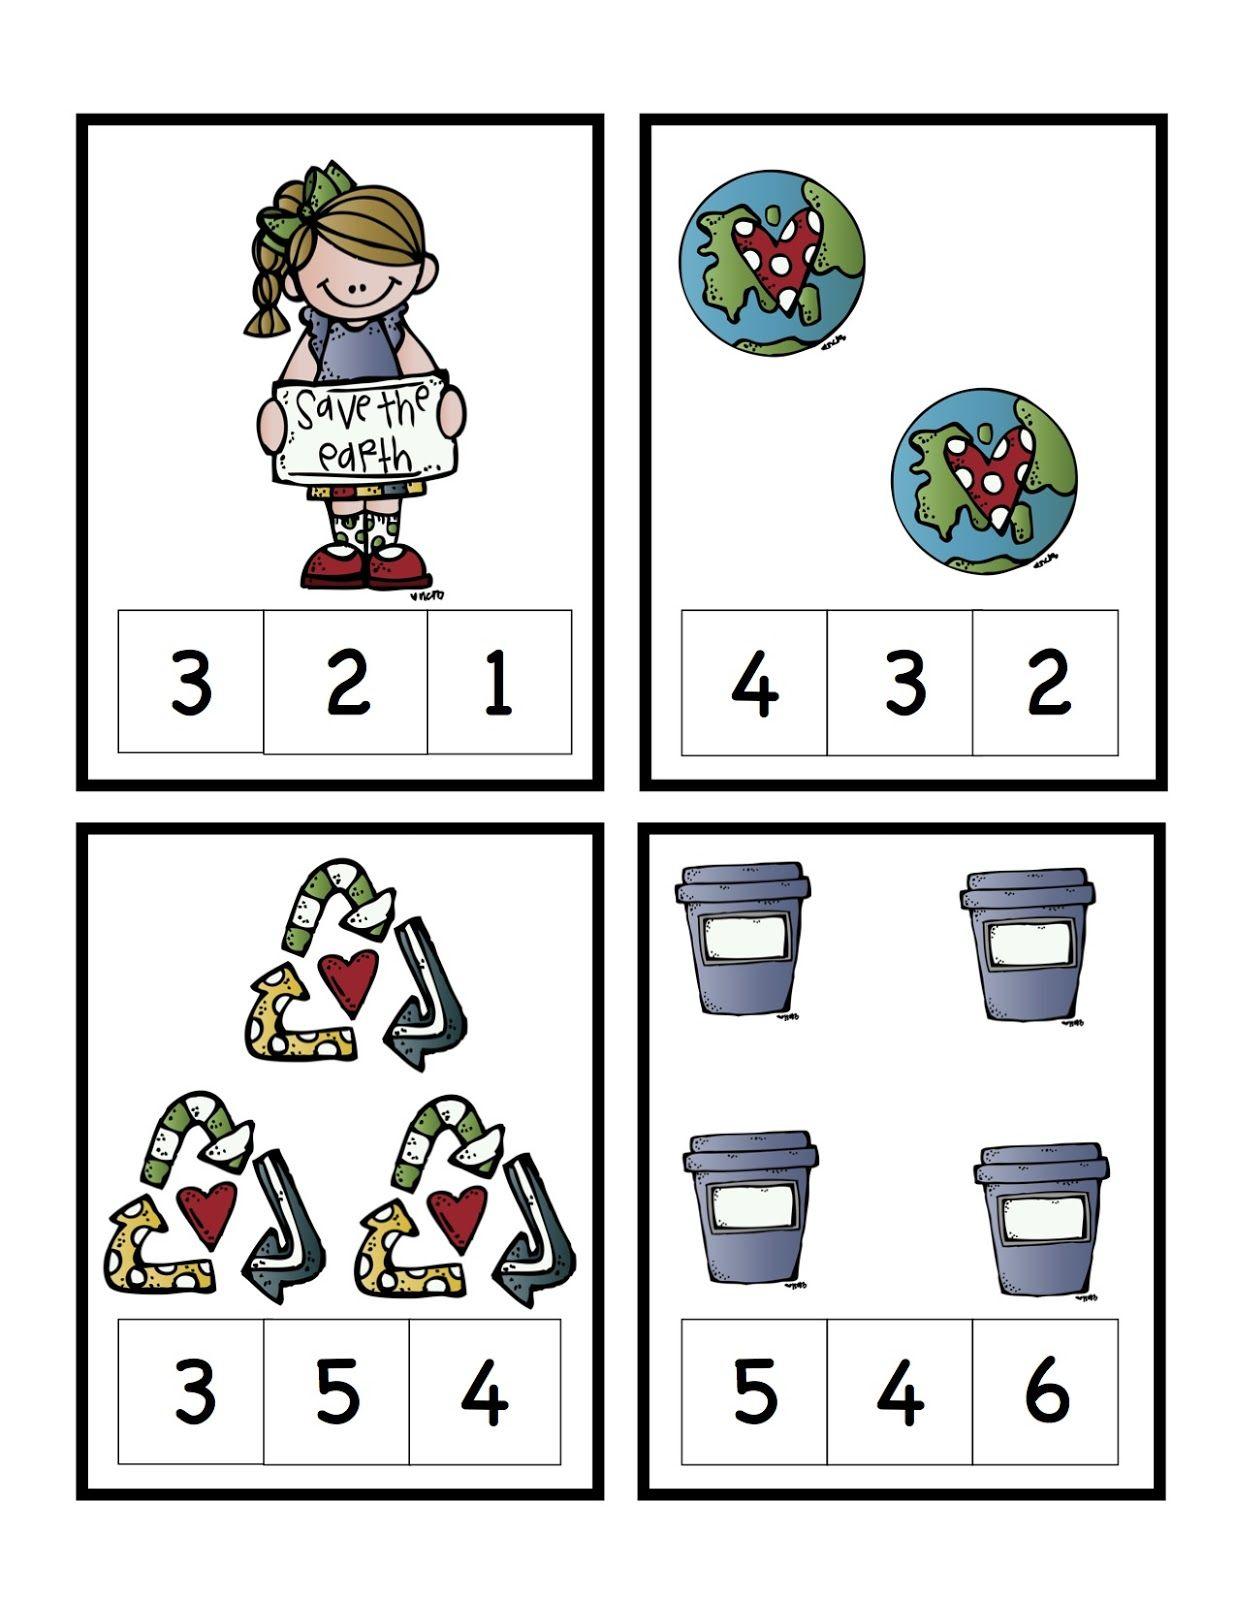 Free Printable Earth Day Worksheets For Kindergarten